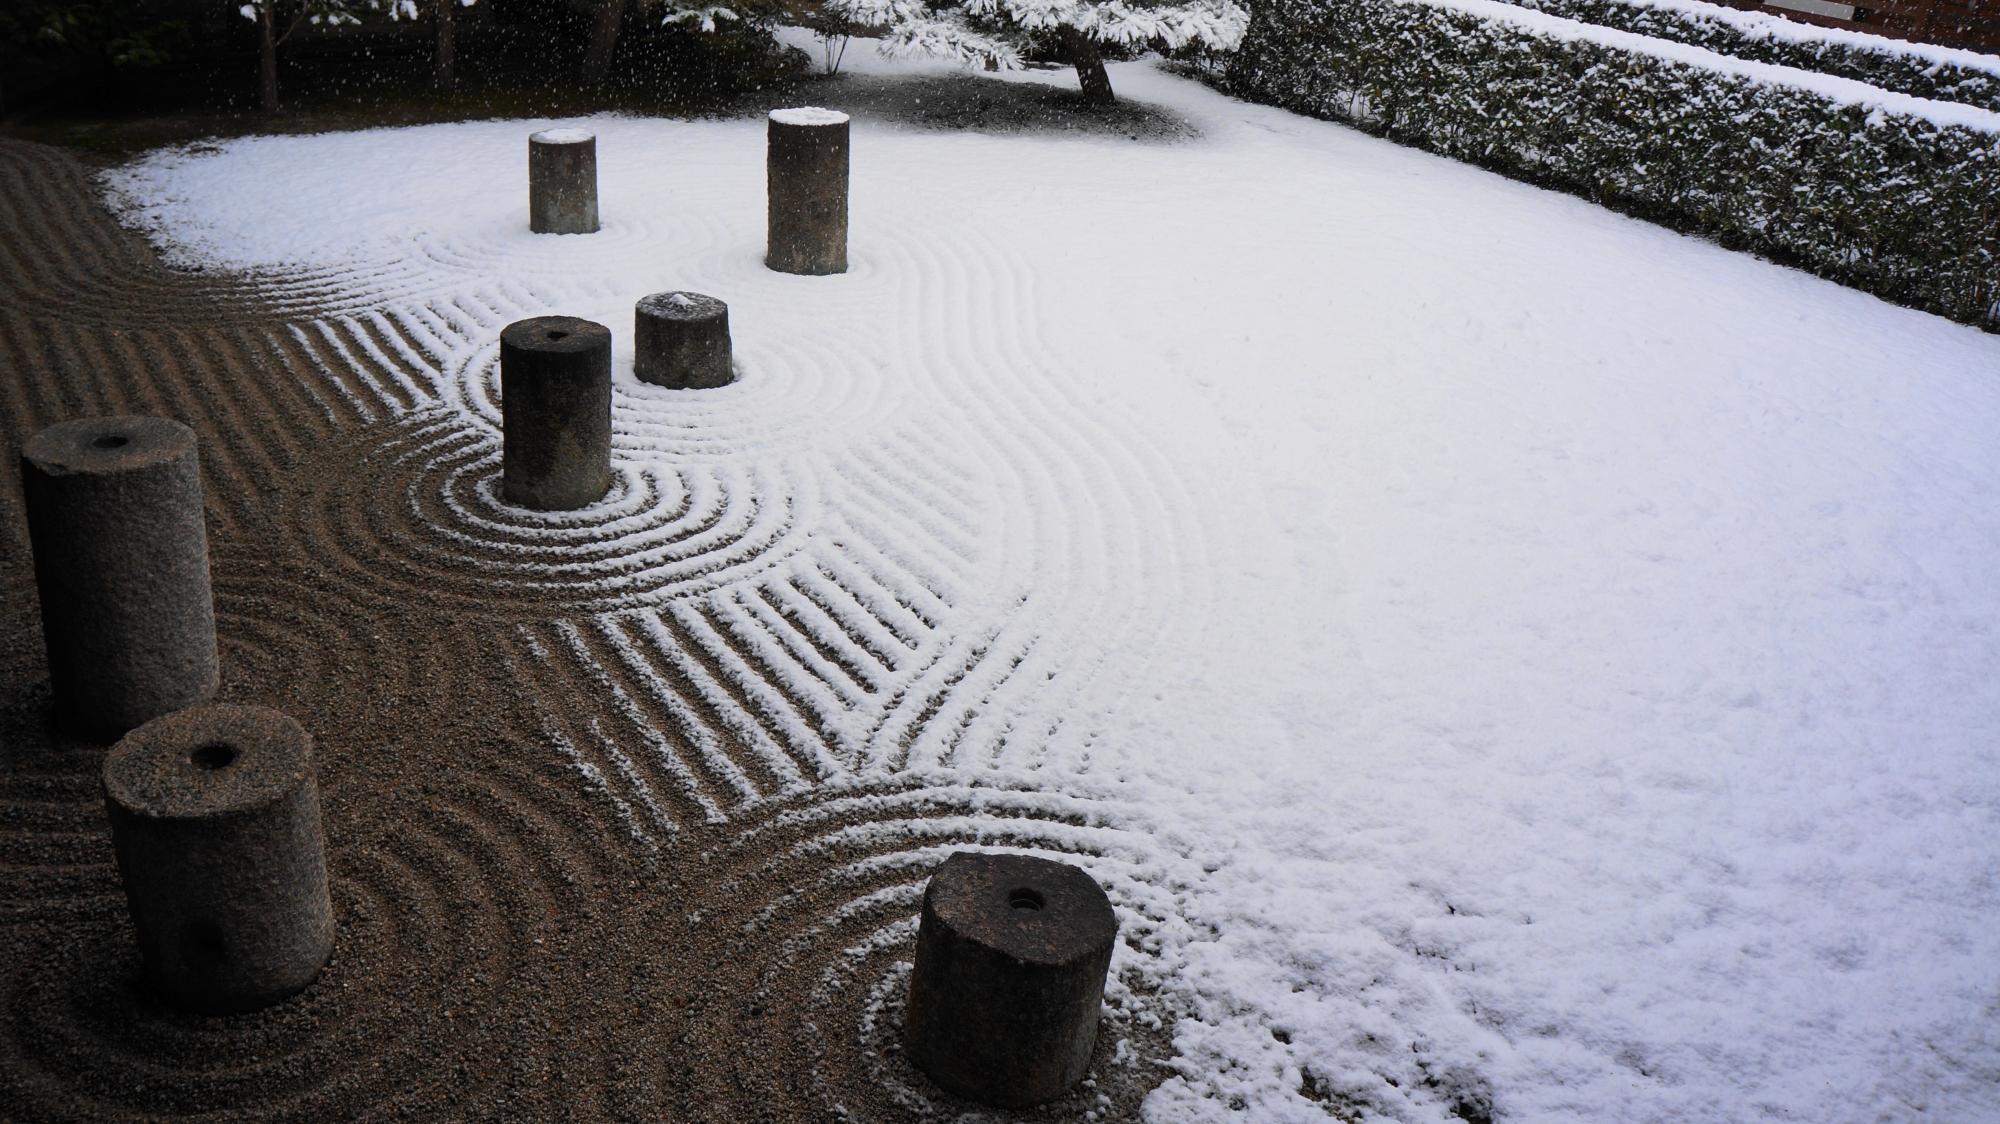 東福寺の方丈東庭(方丈庭園東庭)の雪景色